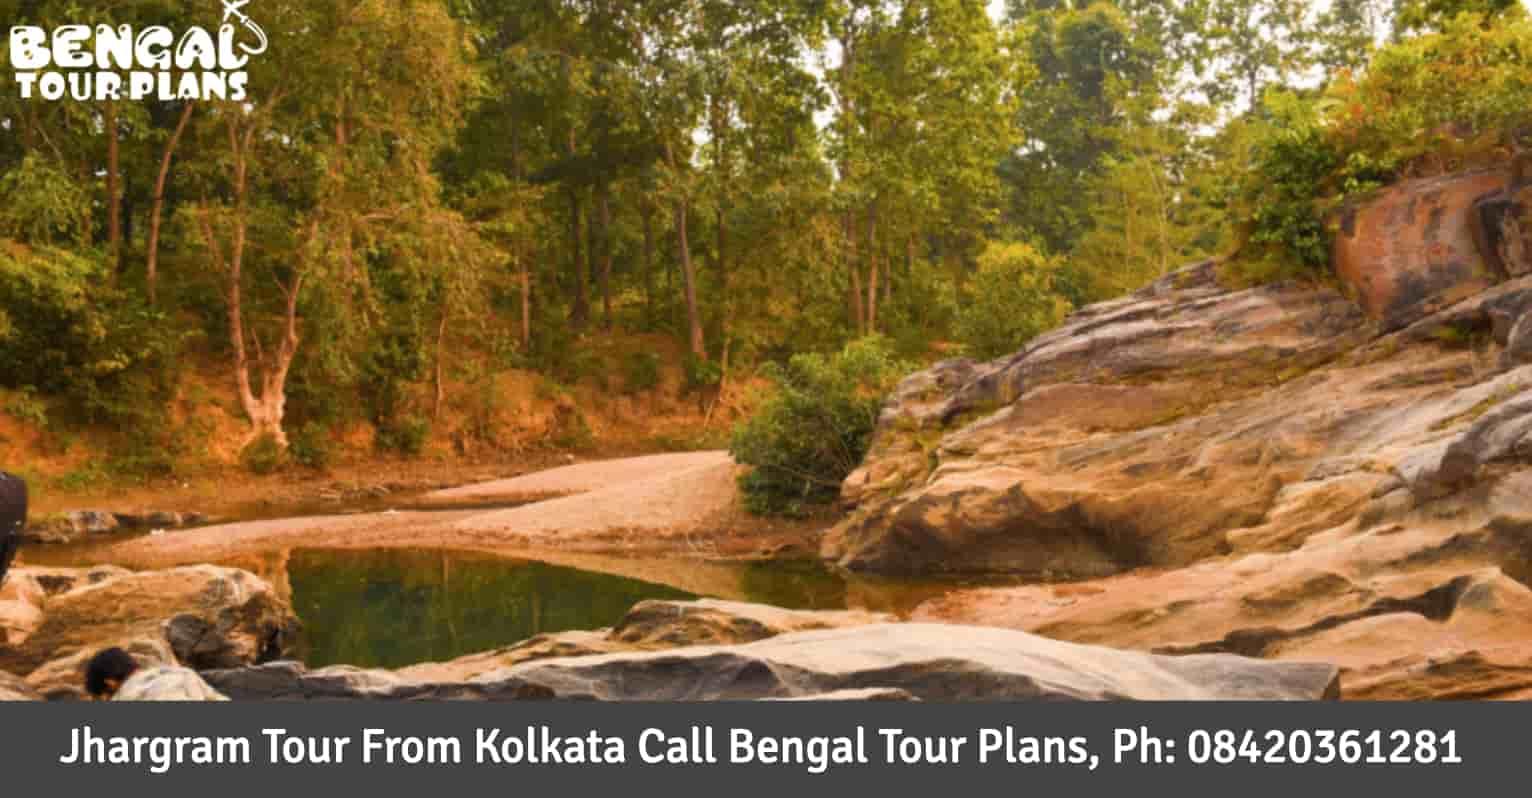 Jhargram Tour Package From Kolkata